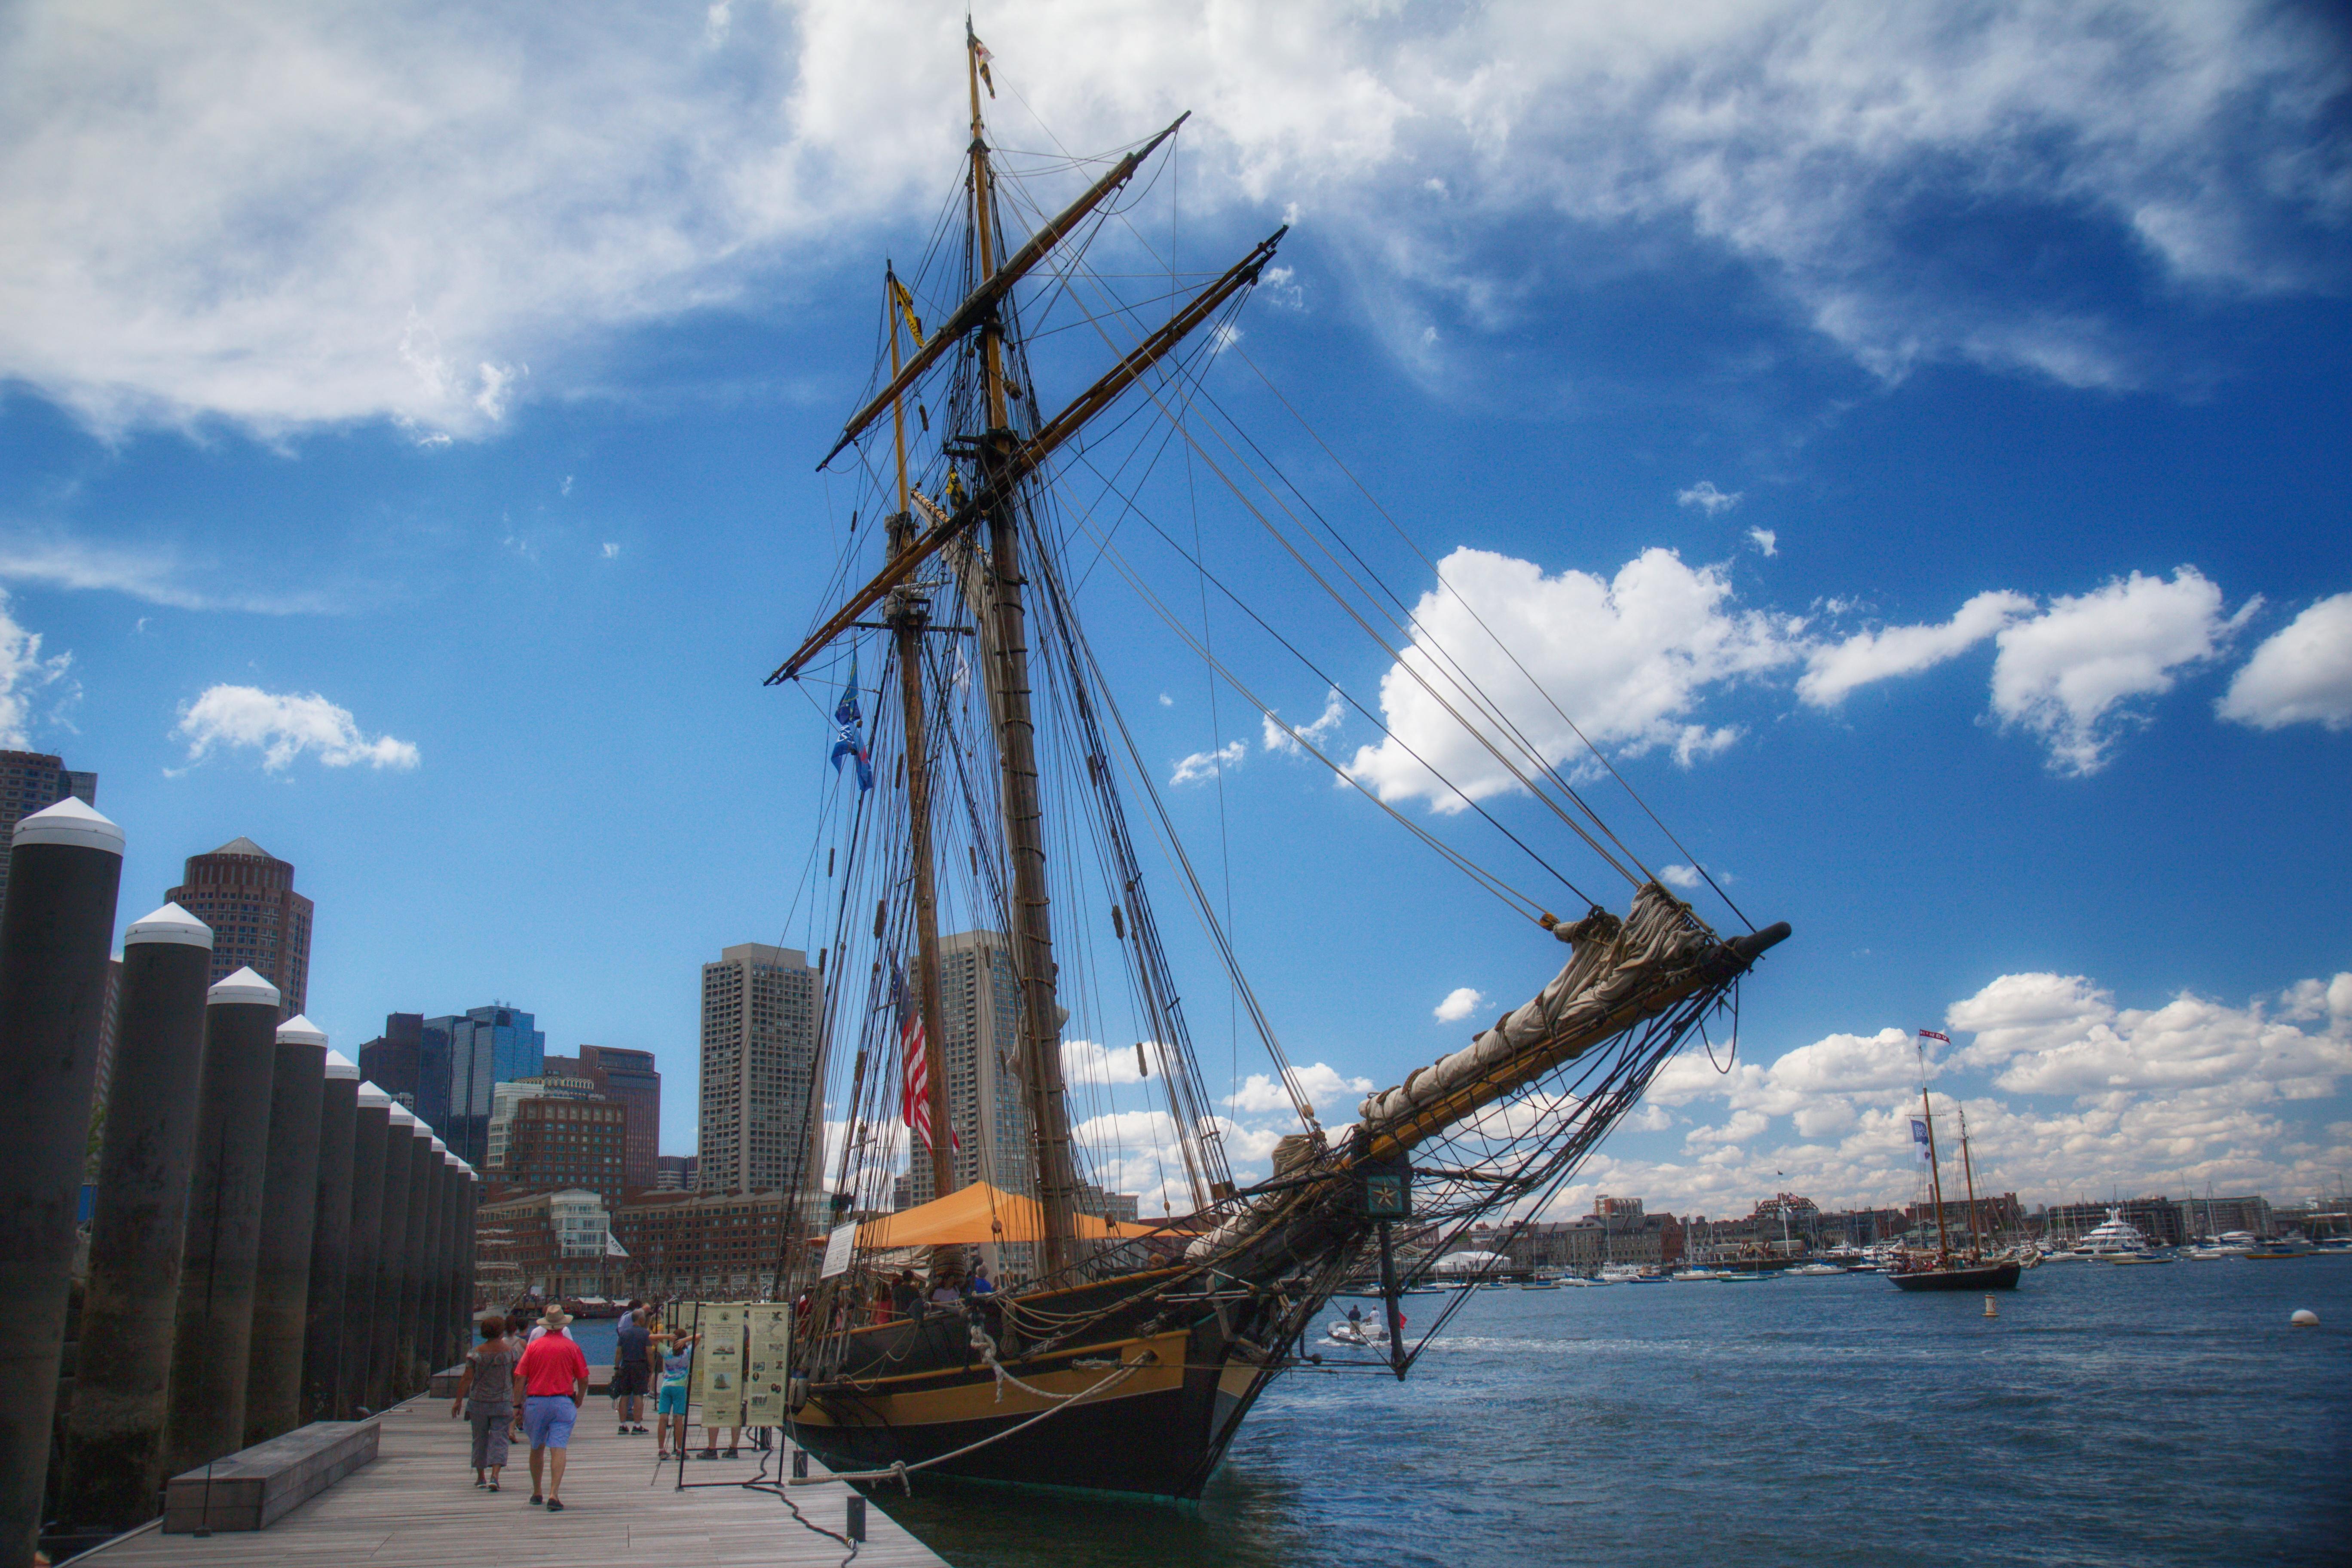 Pirate Classics (episode 80) - HUB History: Boston history podcast